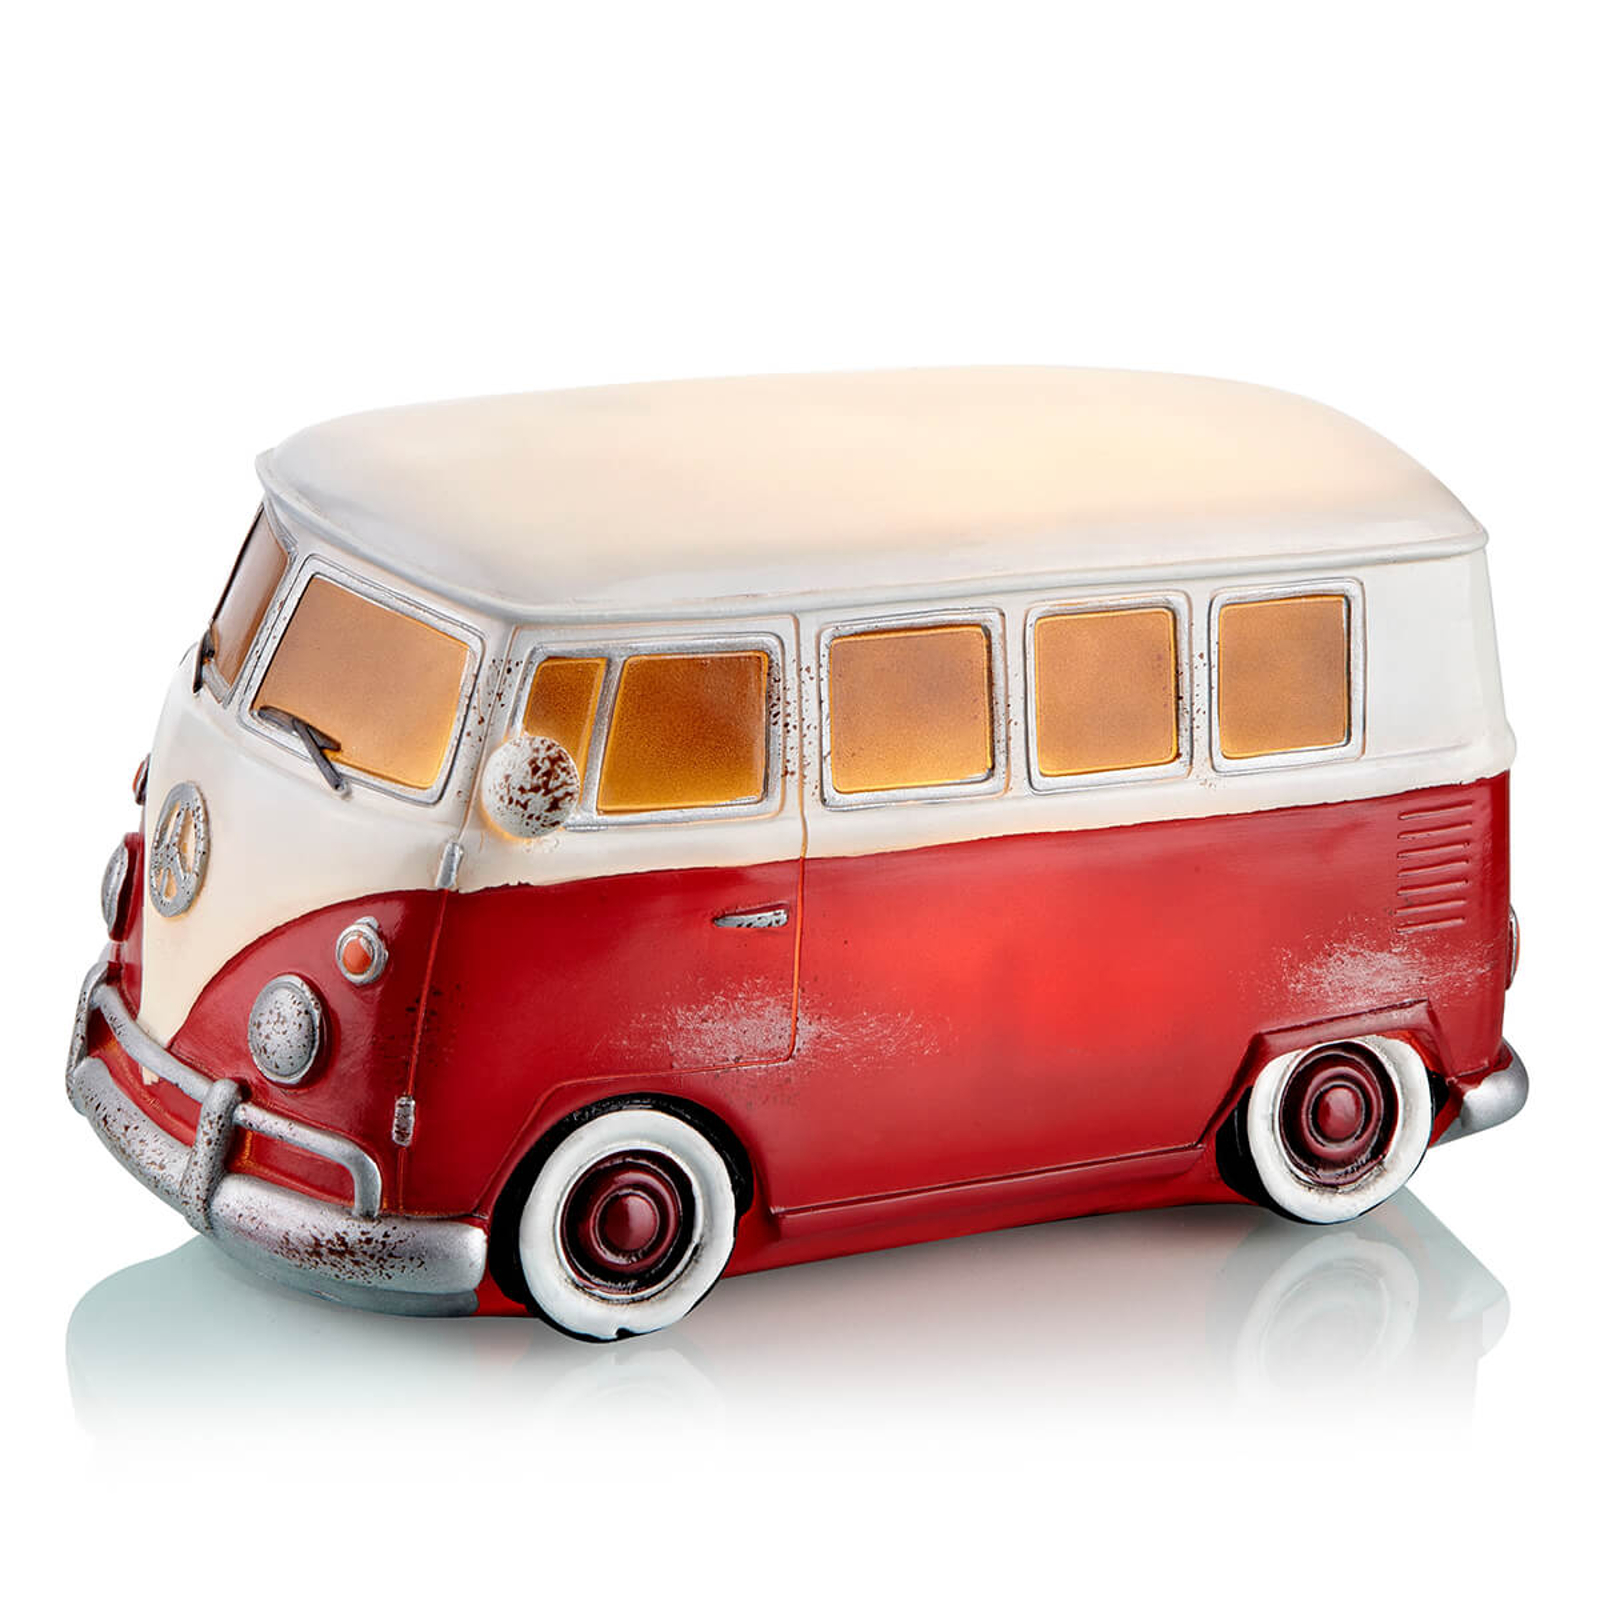 LED lamp Nostalgi in vintage VW busdesign